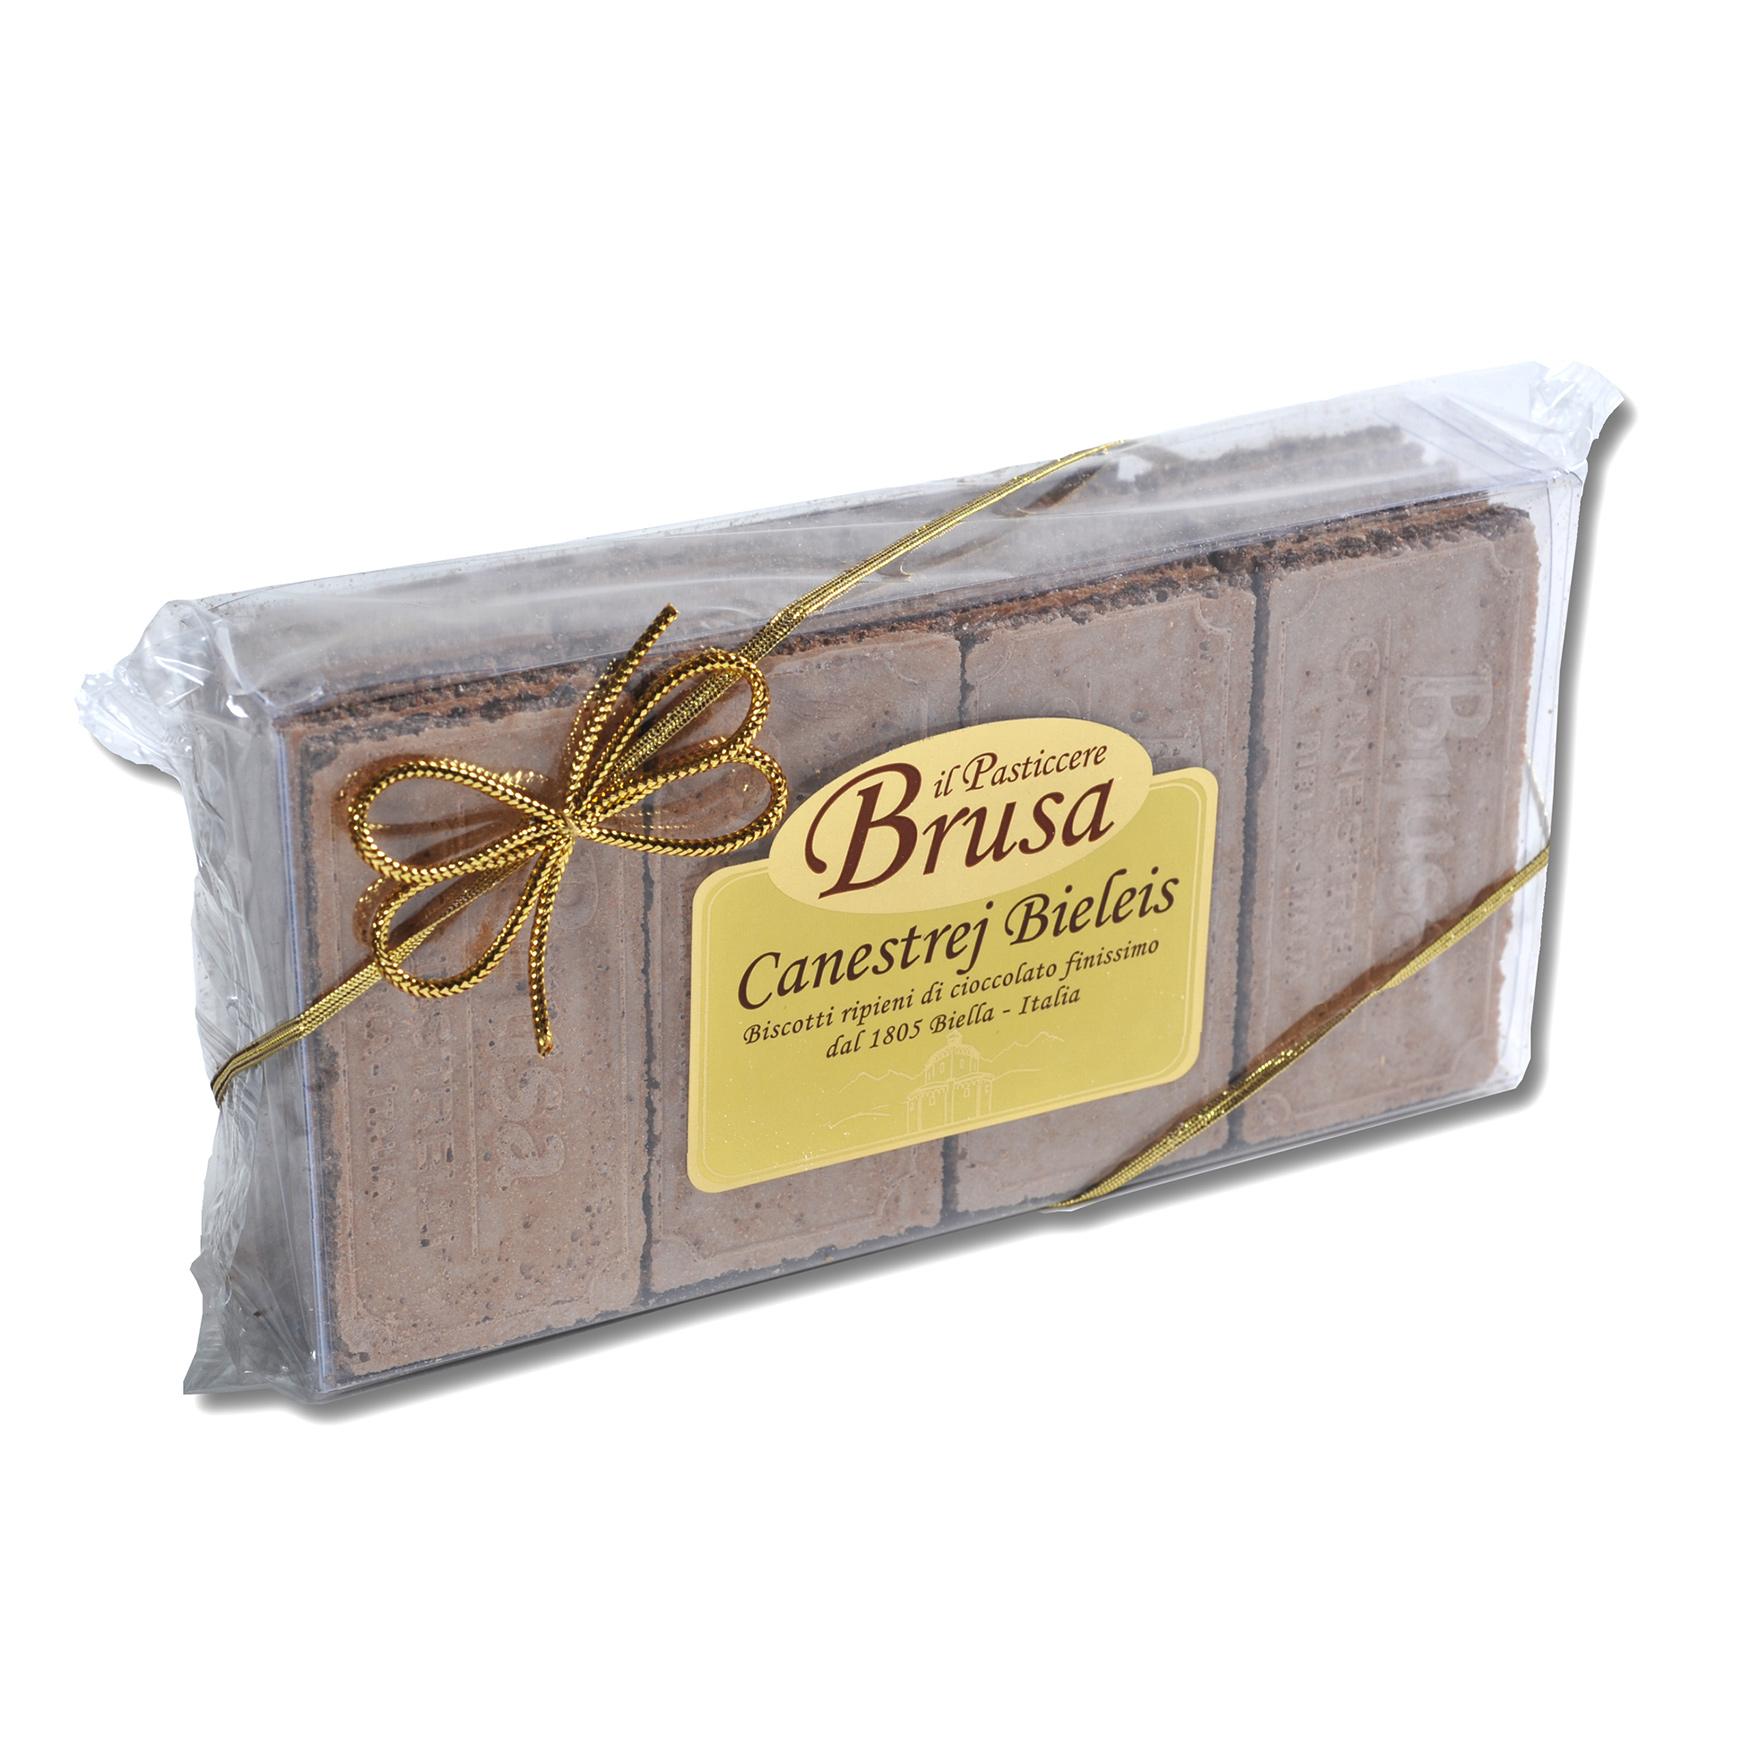 canestrelli-biellesi饼干-300g